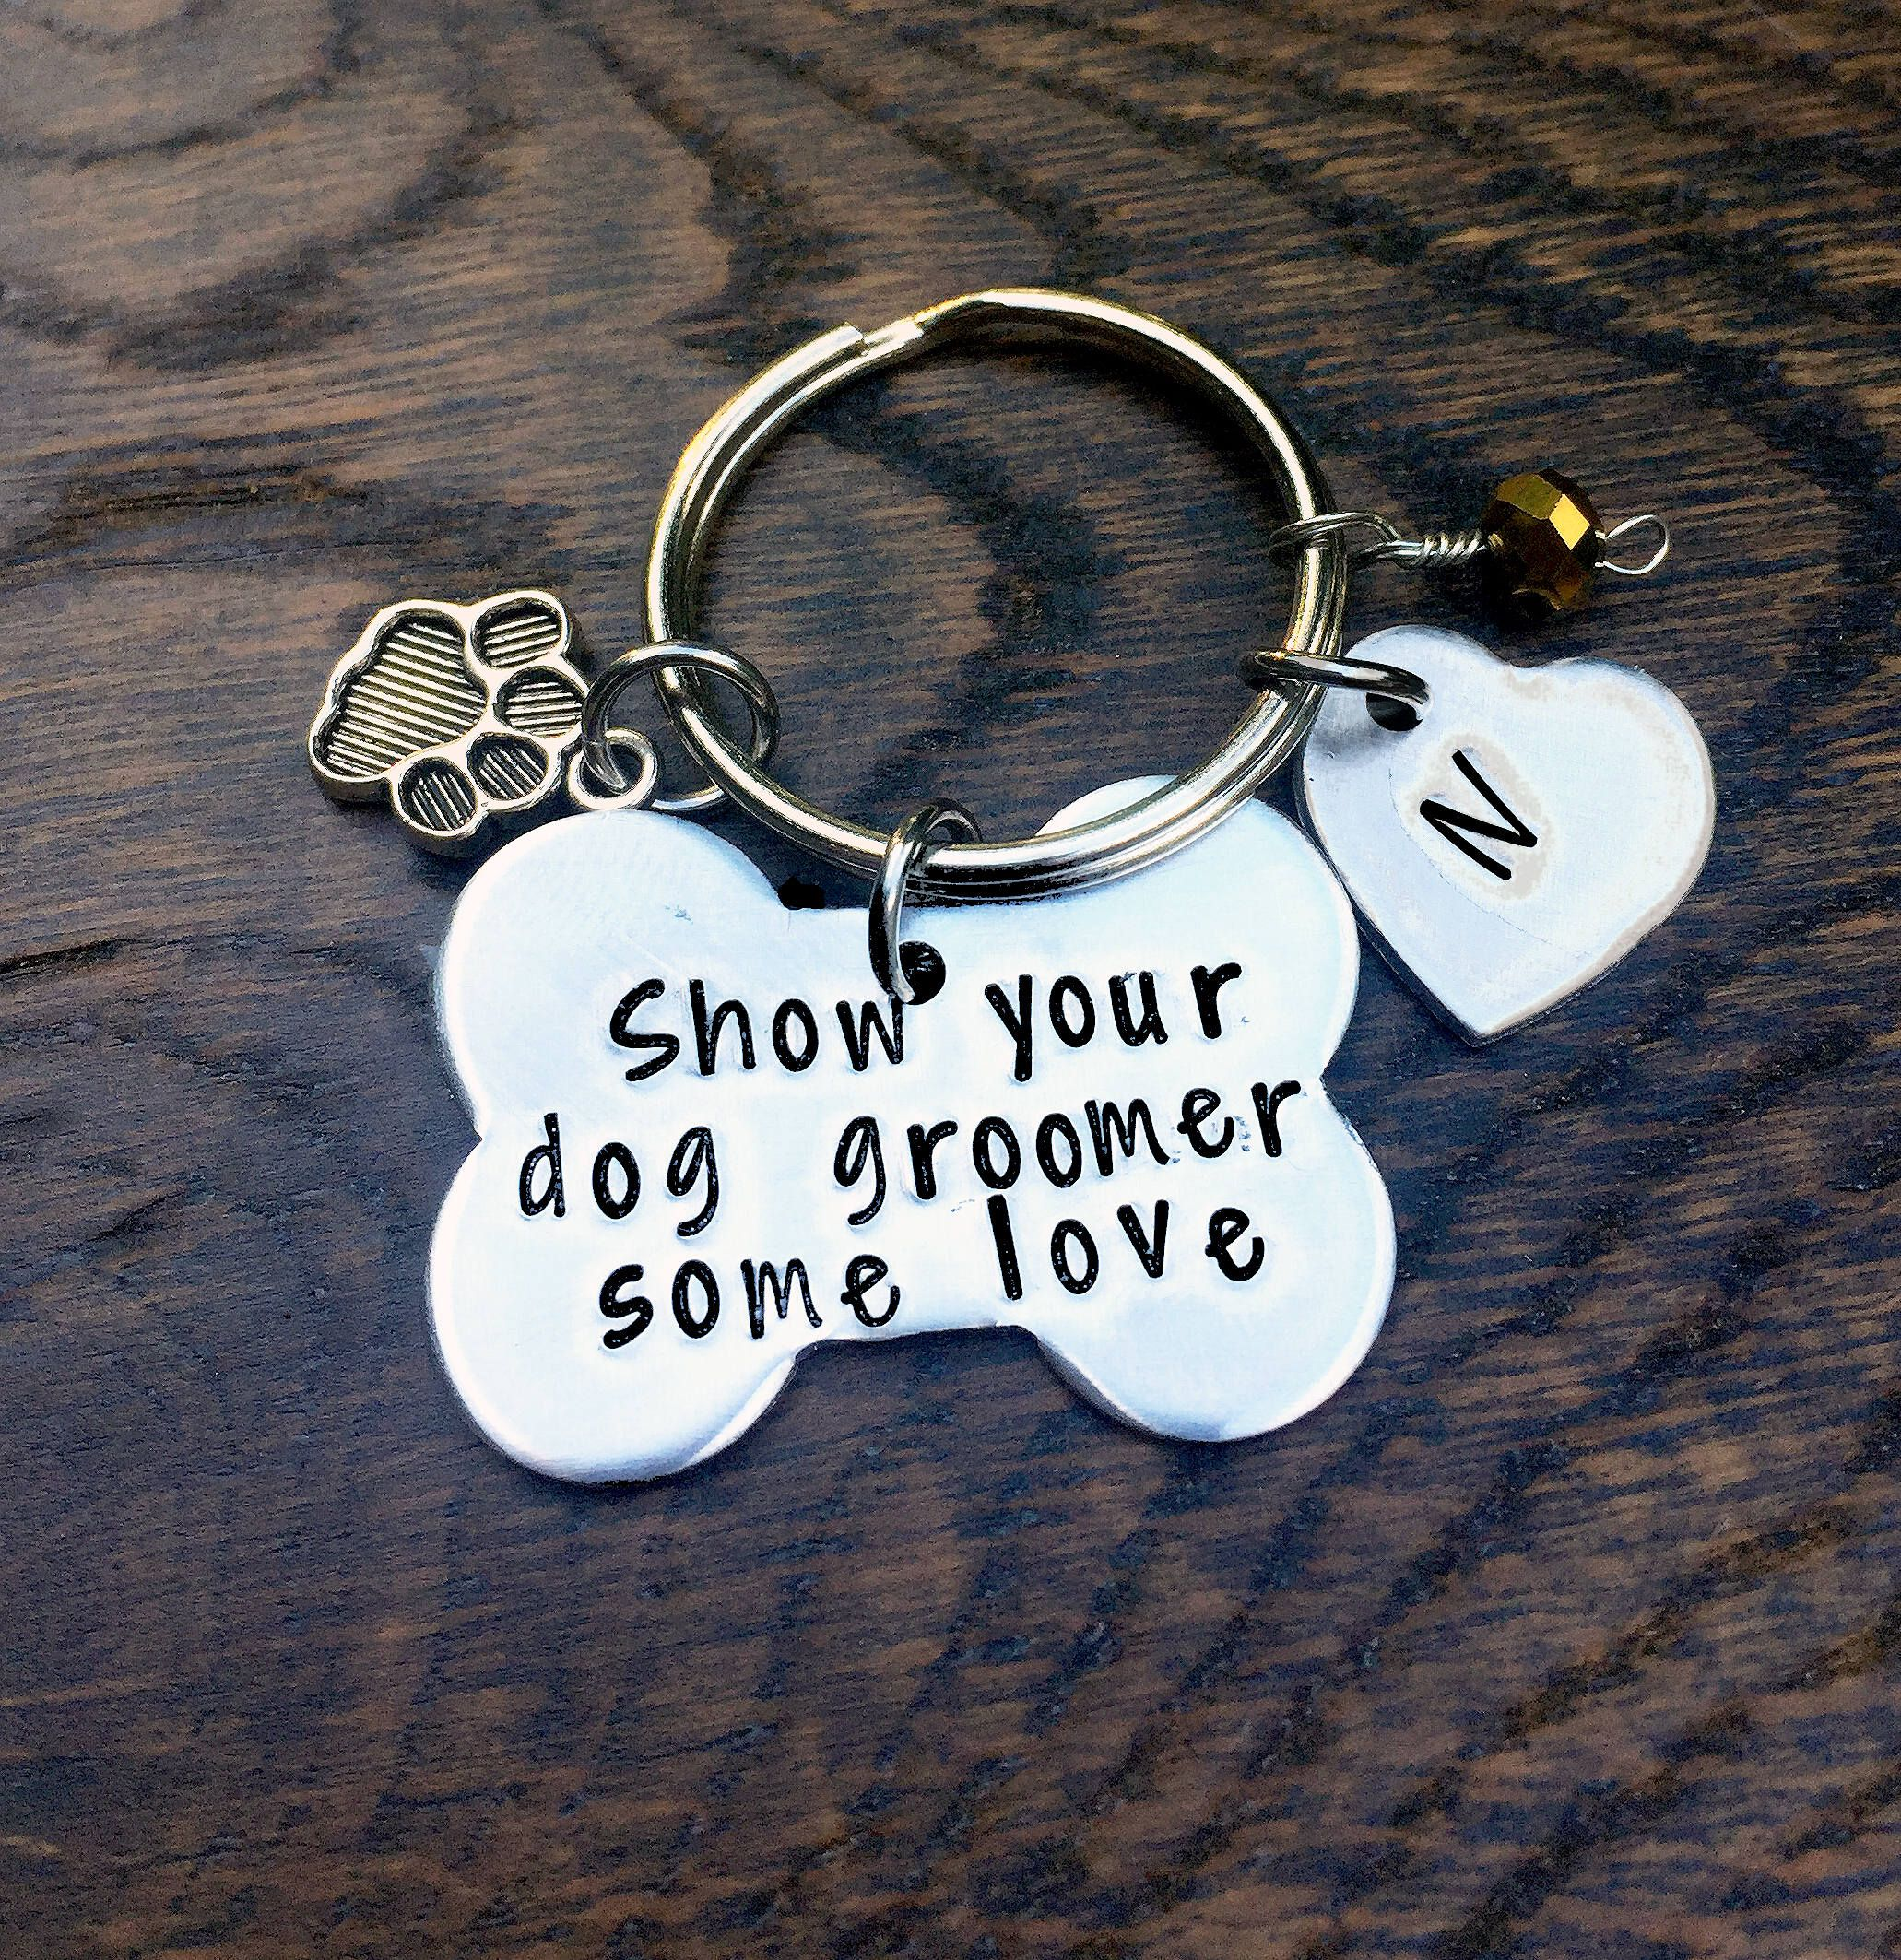 Dog groomer gift animal grooming thank you present pet